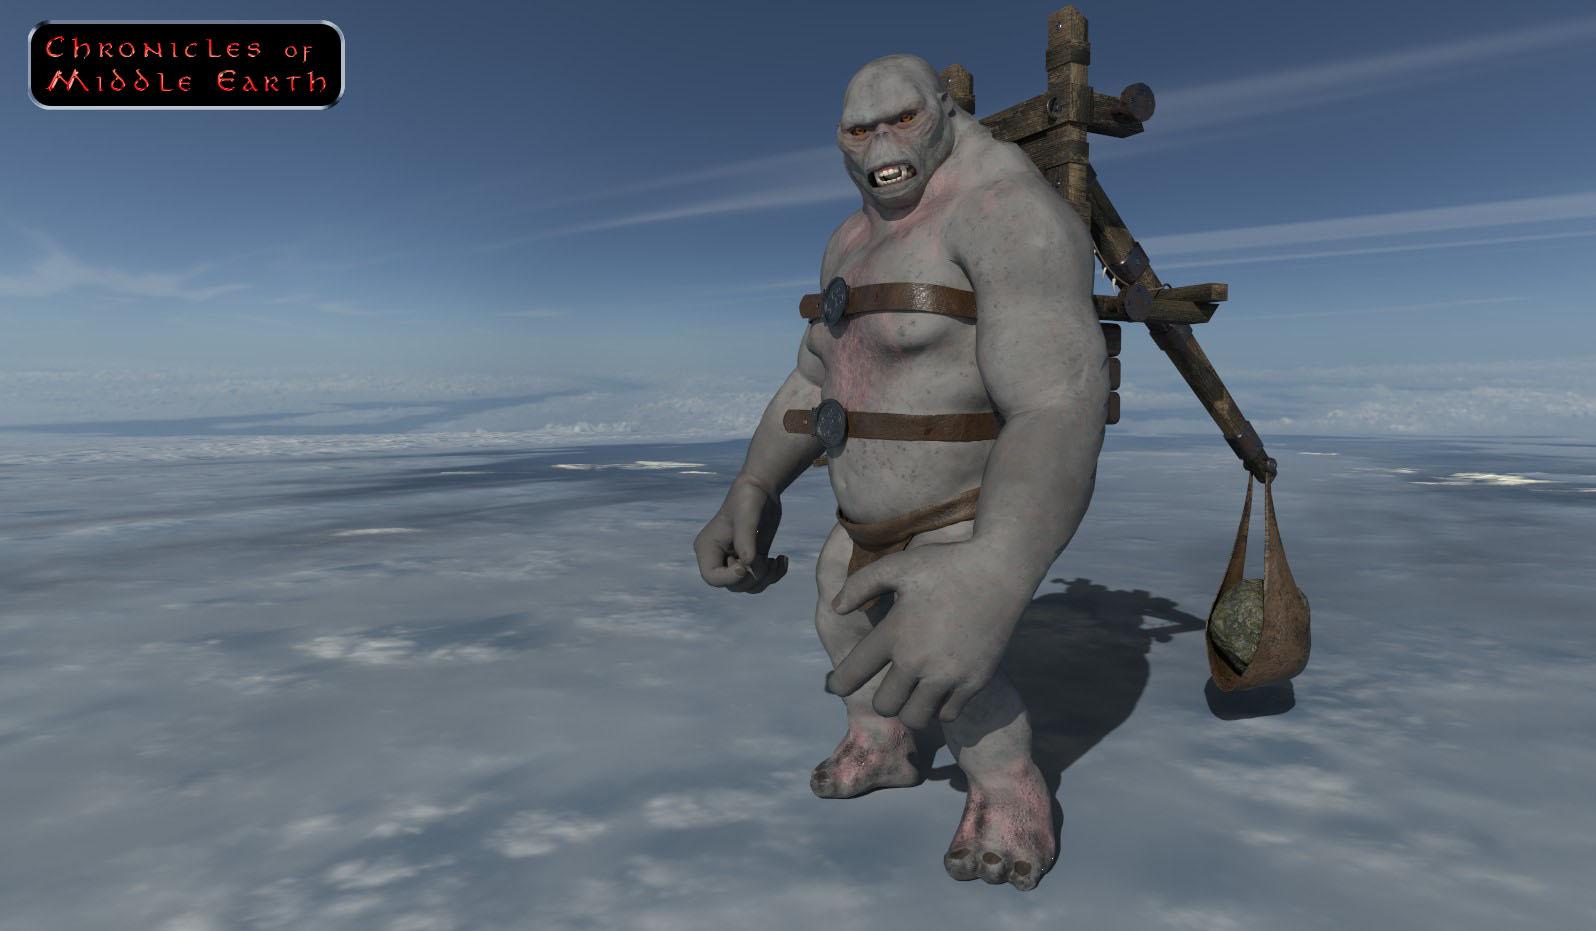 Guldur War Troll Image Chronicles Of Middle Earth Mod For Mount